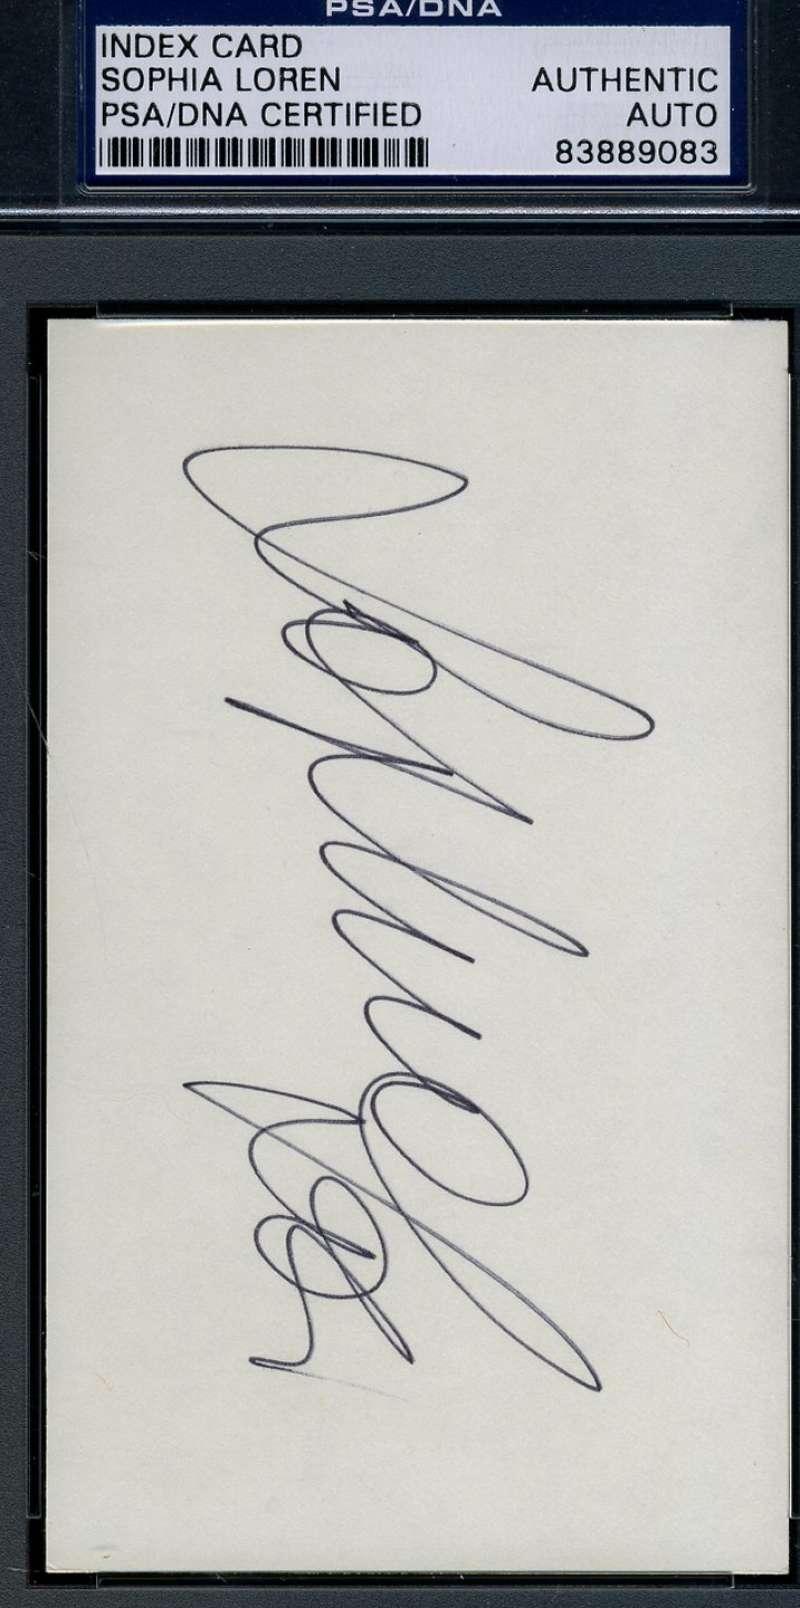 Sophia Loren Signed 3x5 Index Card Psa/dna Certed Authentic Autograph